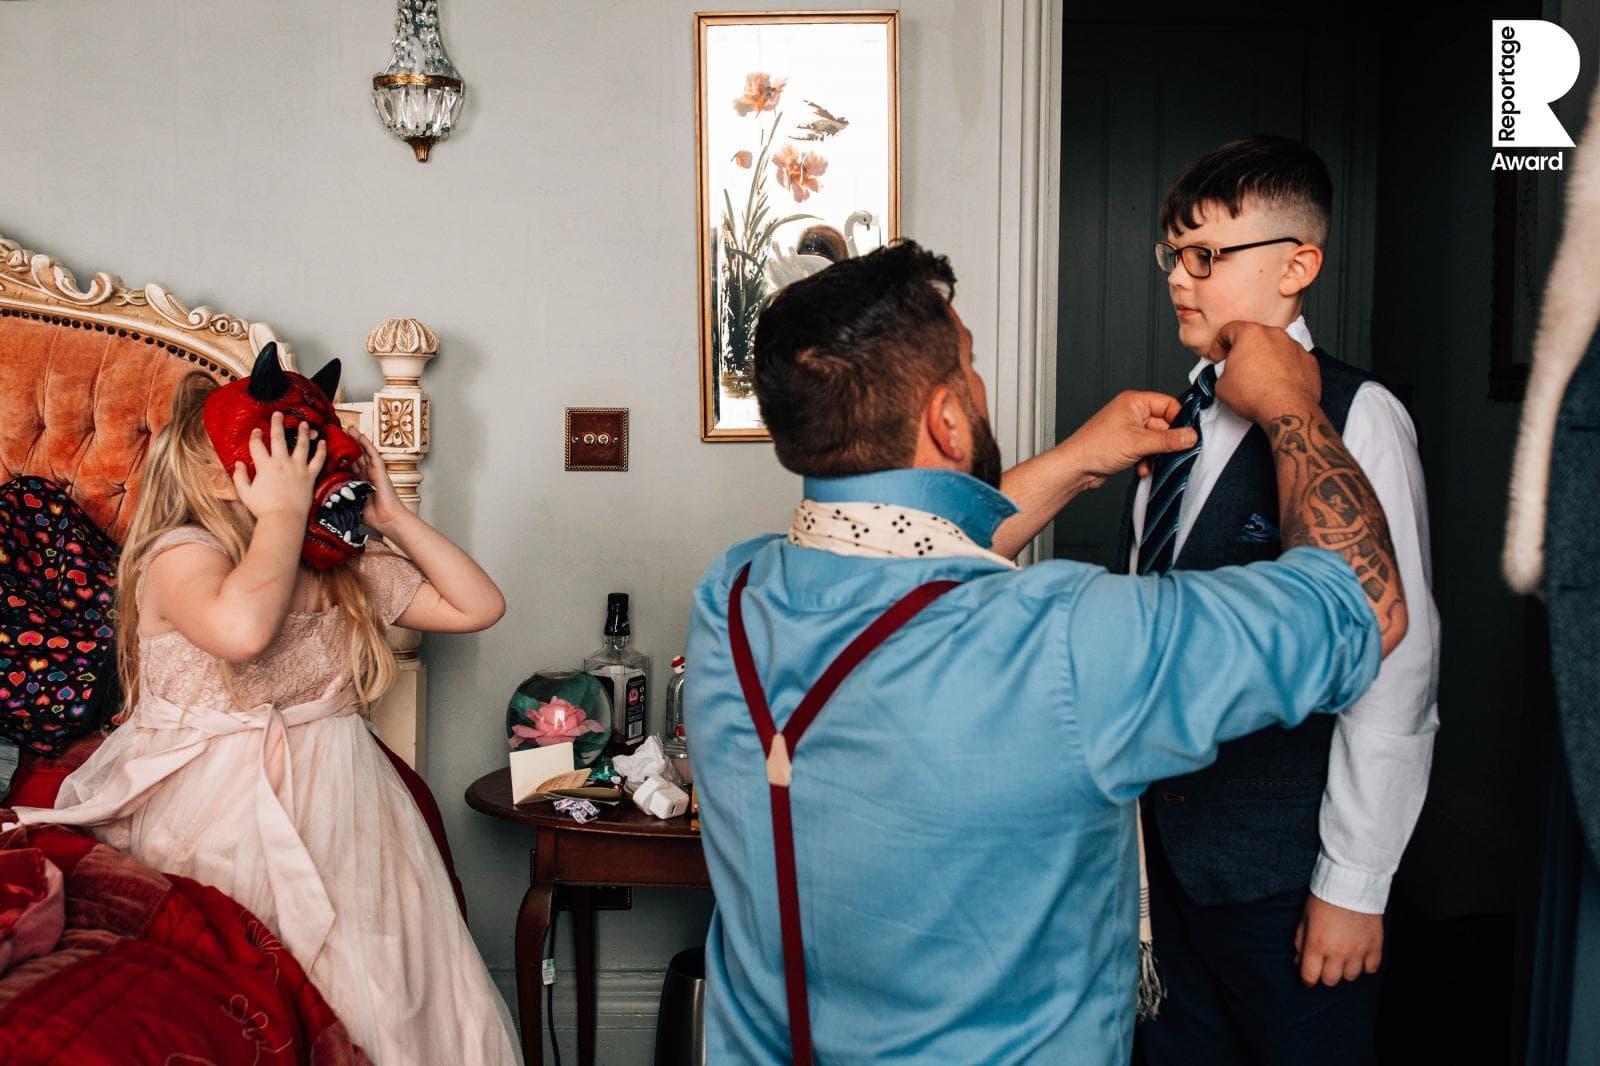 award winning wedding photographer image